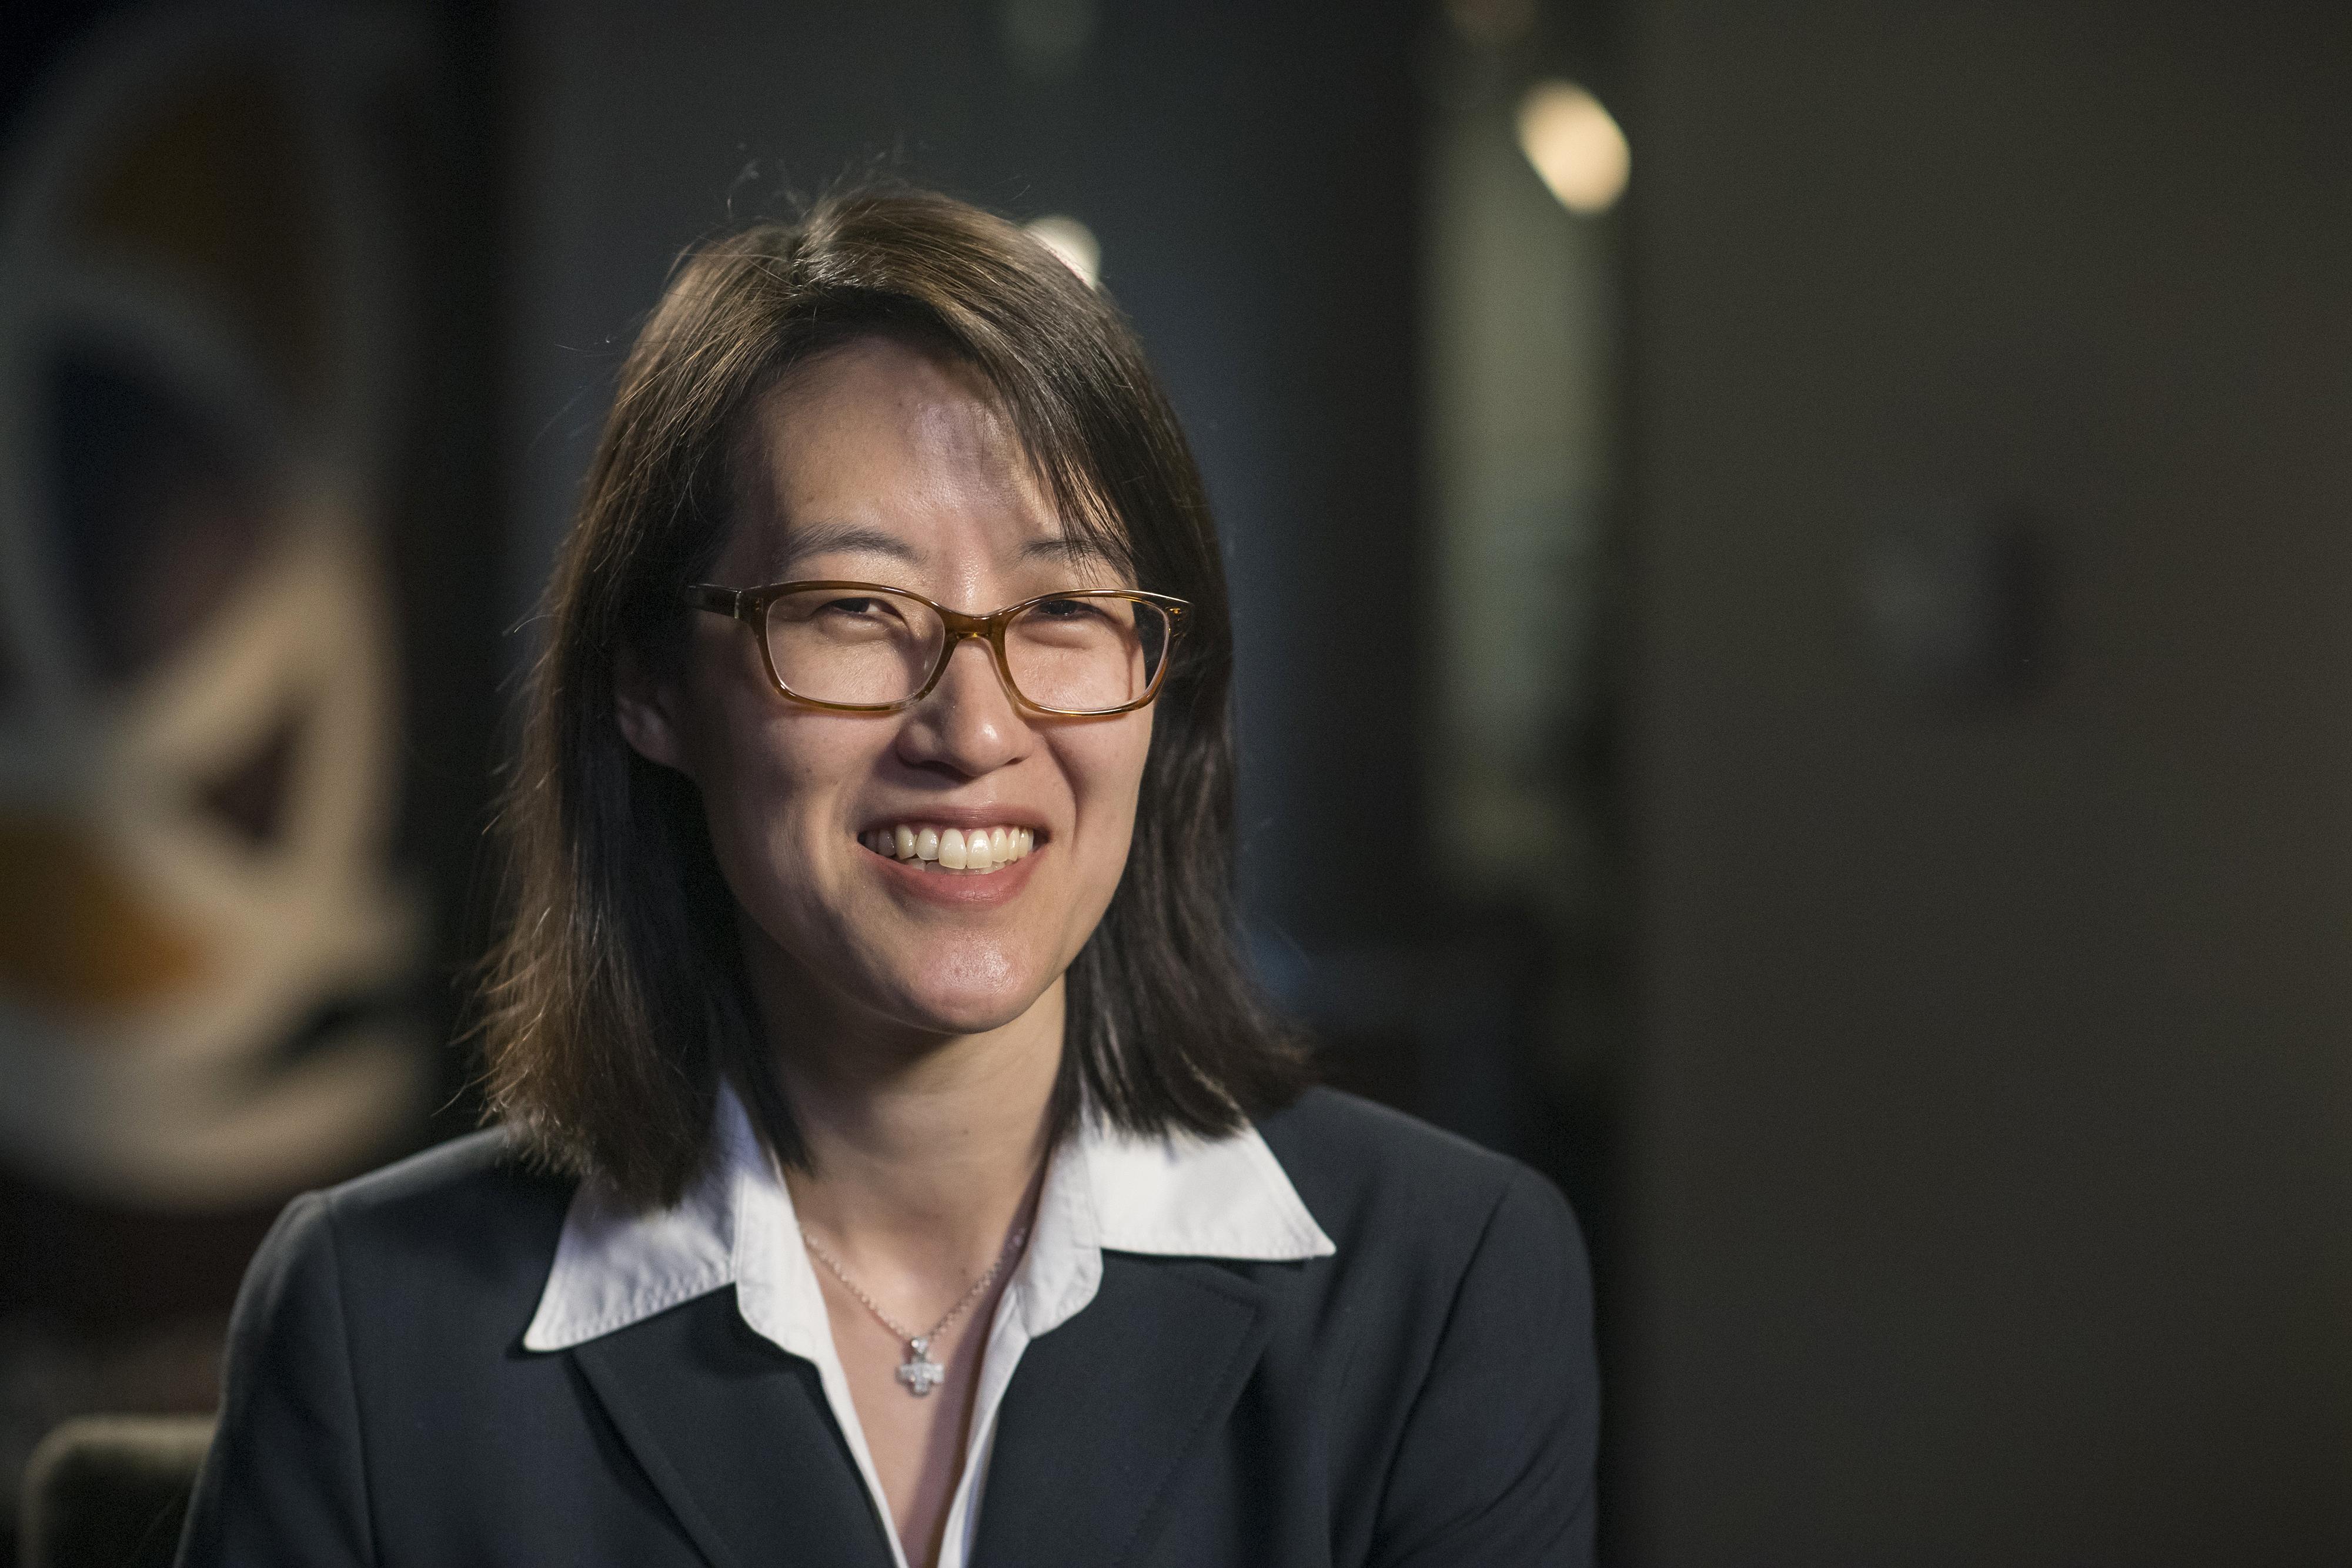 Ex-Kleiner VC Introduces Diversity Initiative